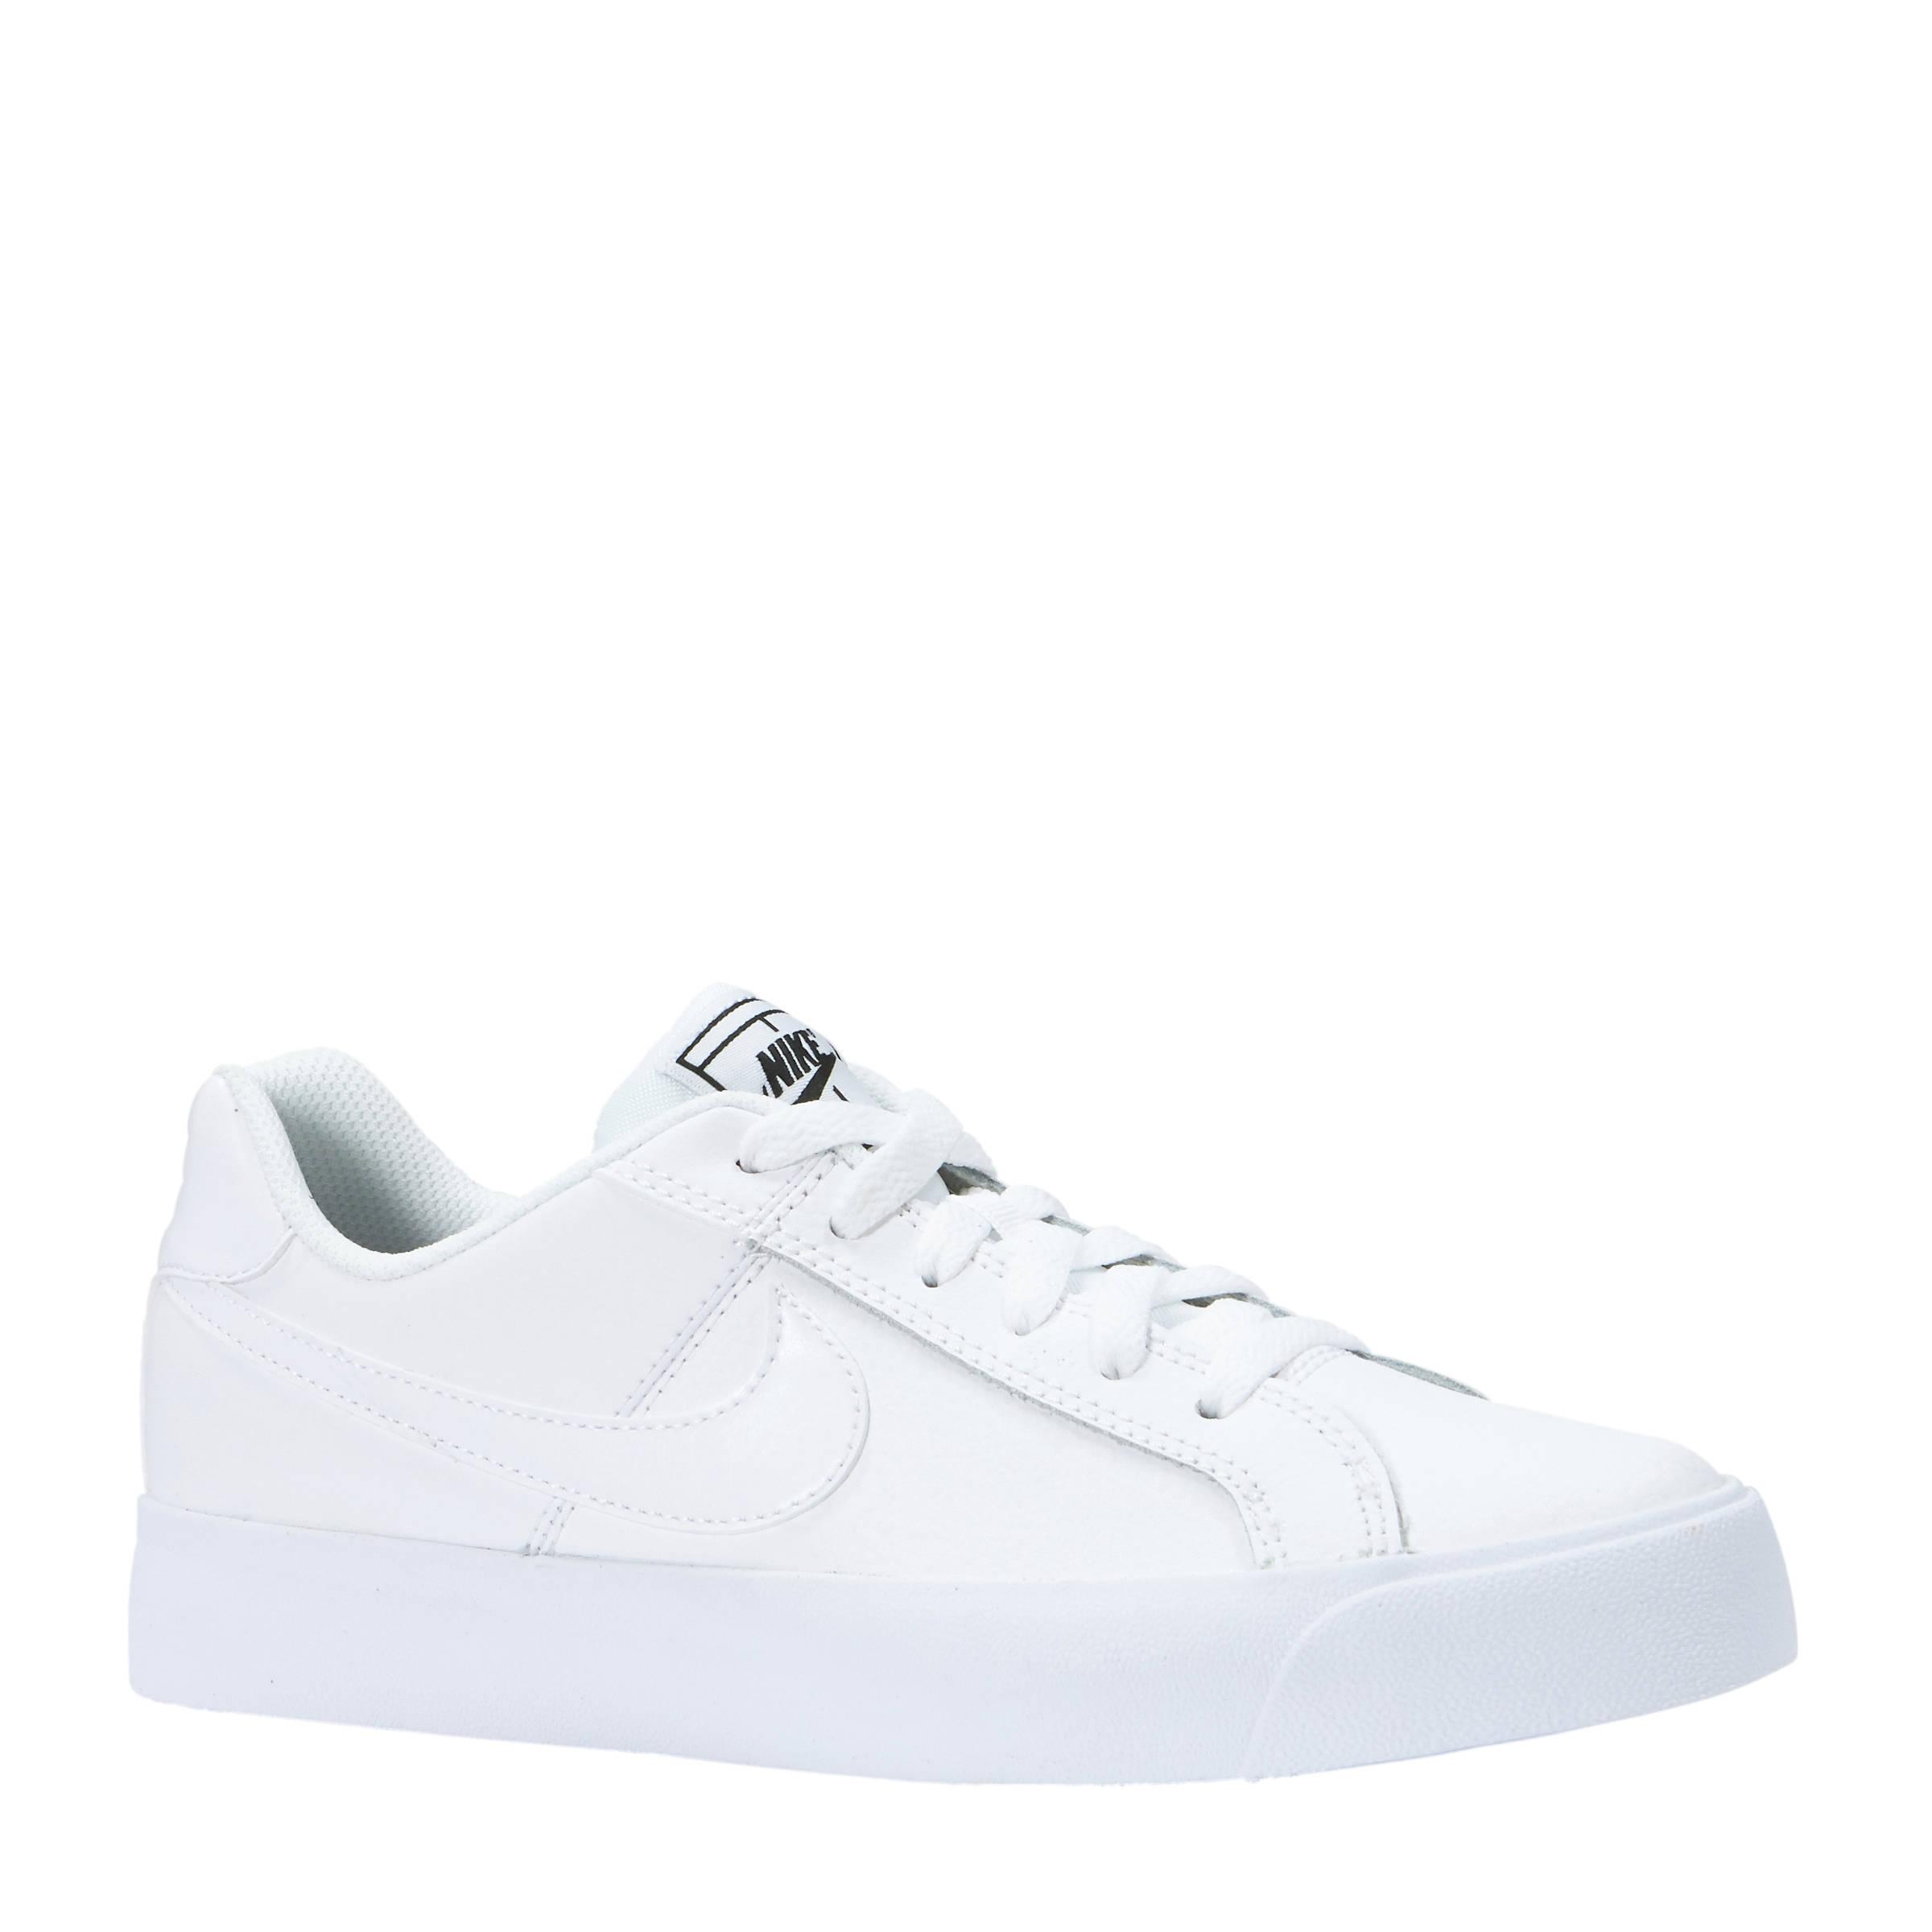 Court Royale AC leren sneakers